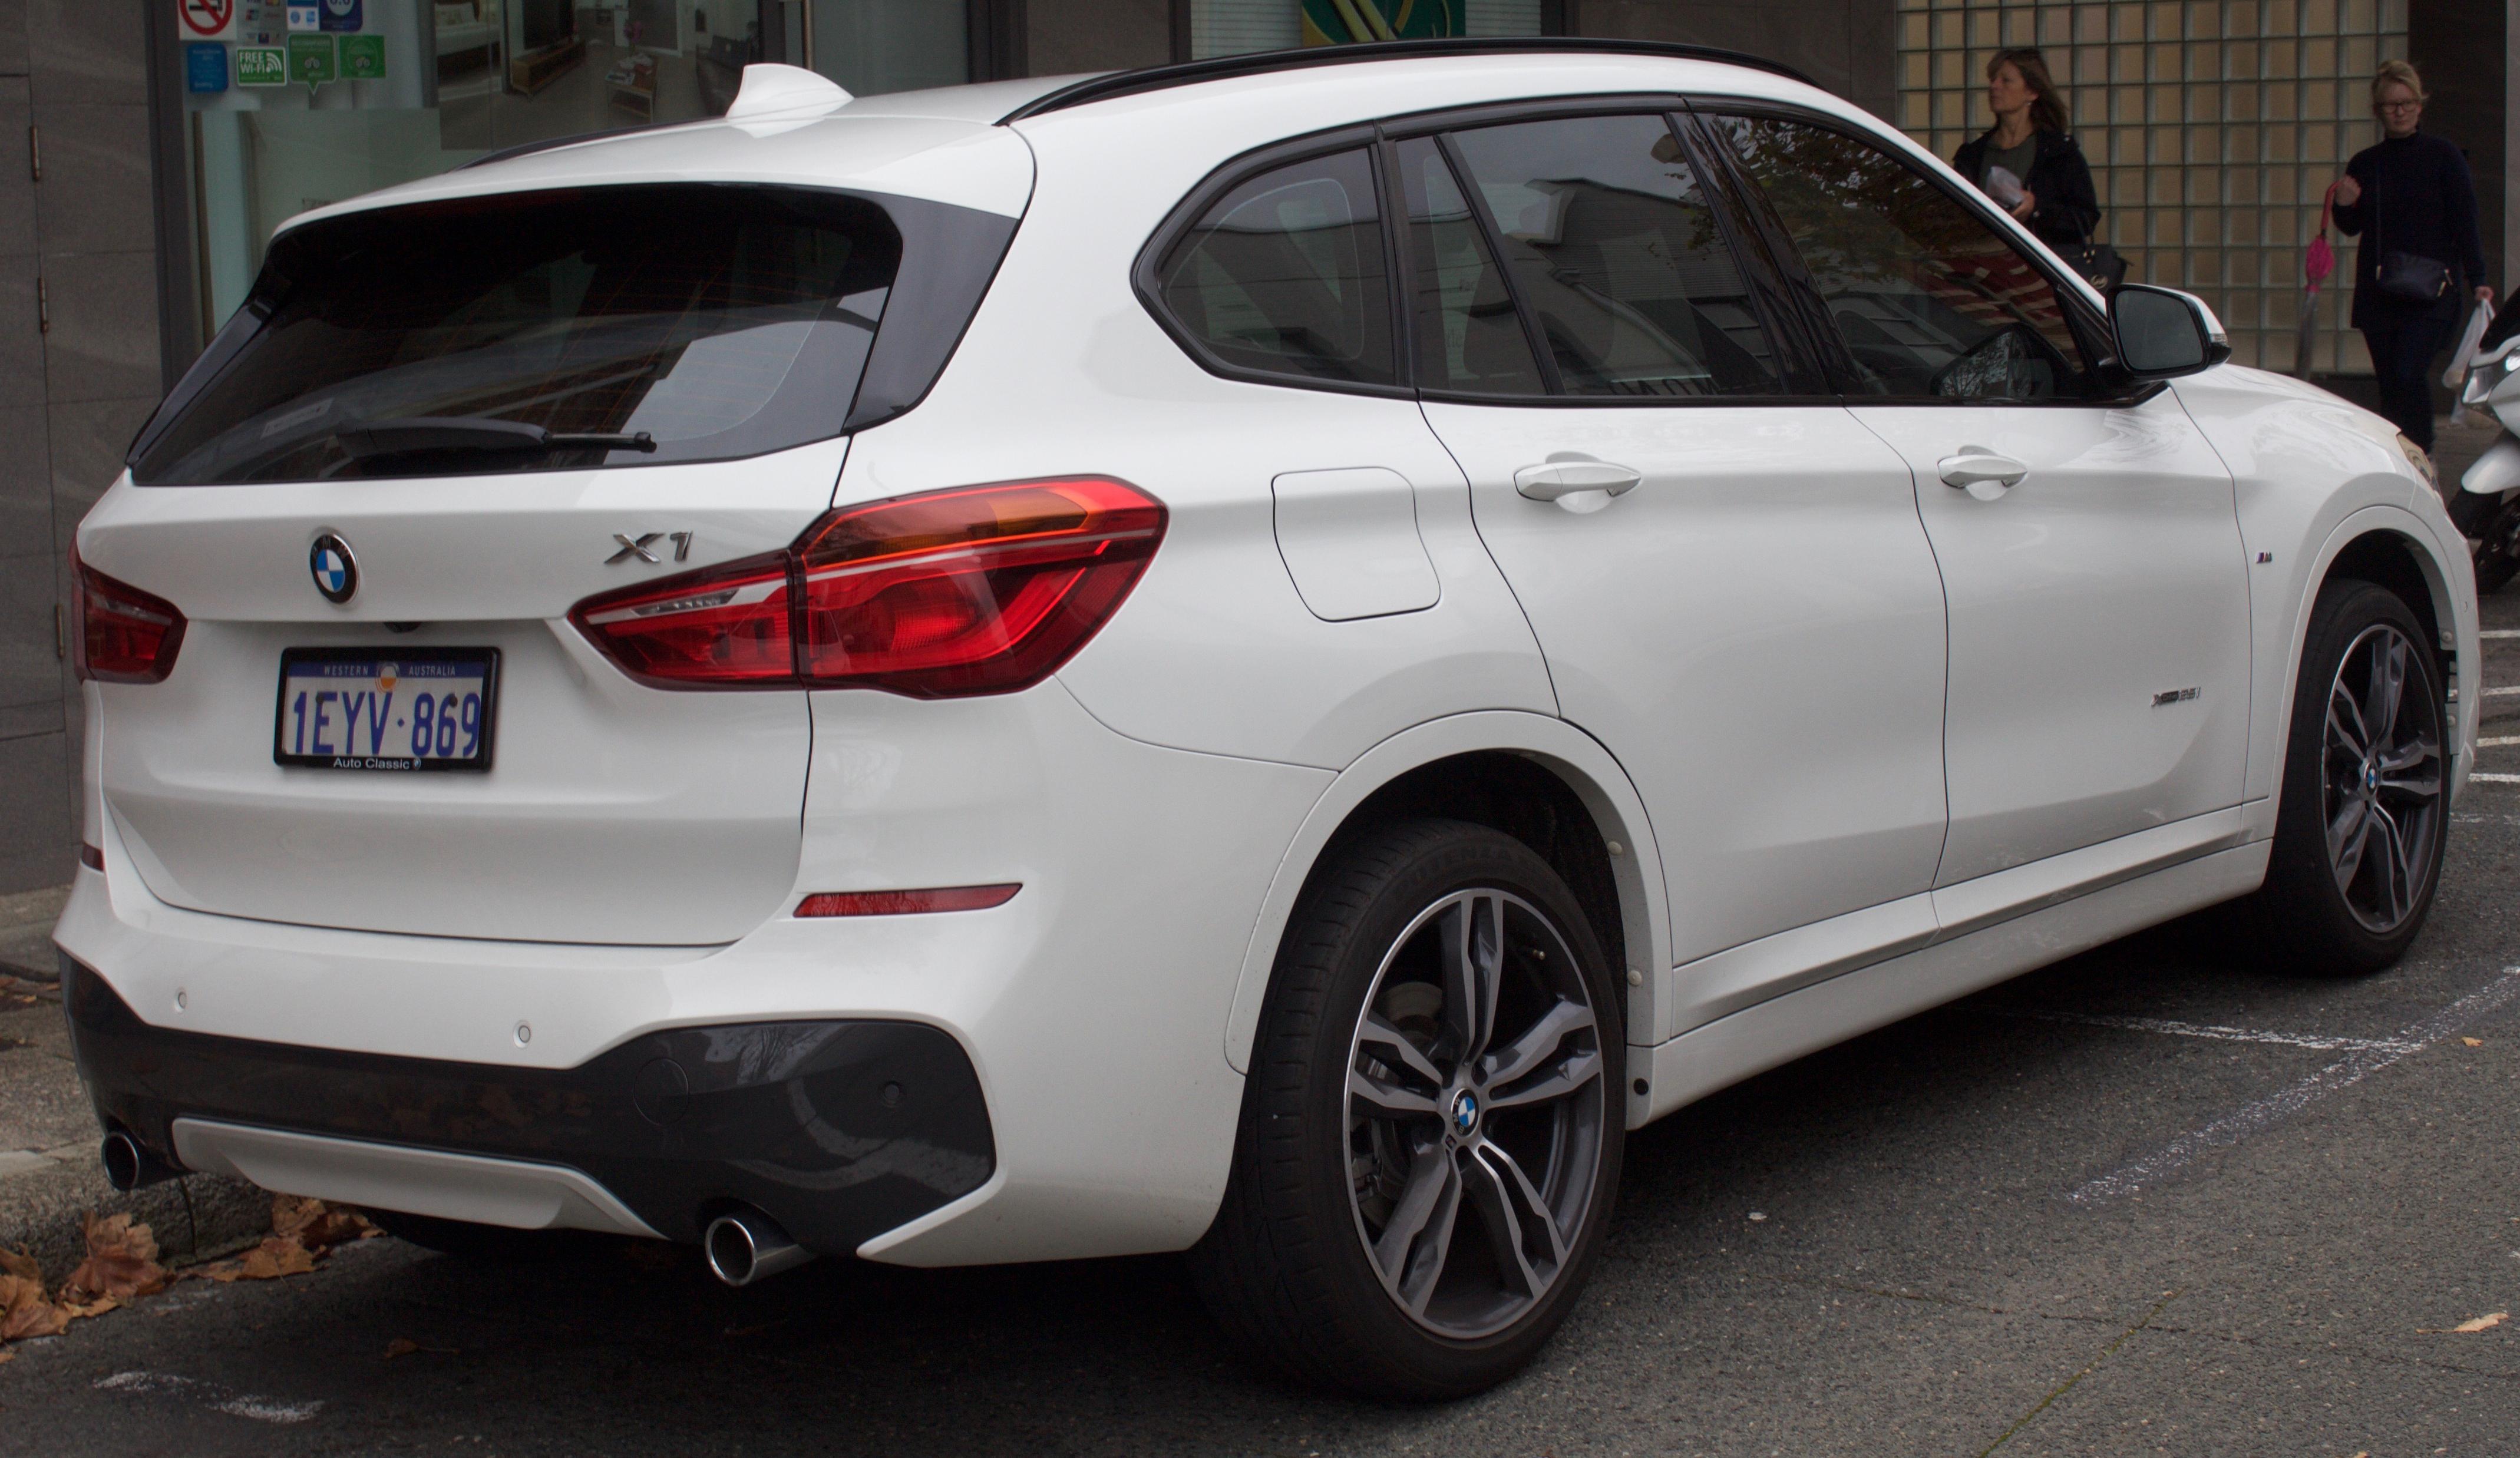 BMW X1 I (E84) 2009 - 2012 SUV 5 door #1